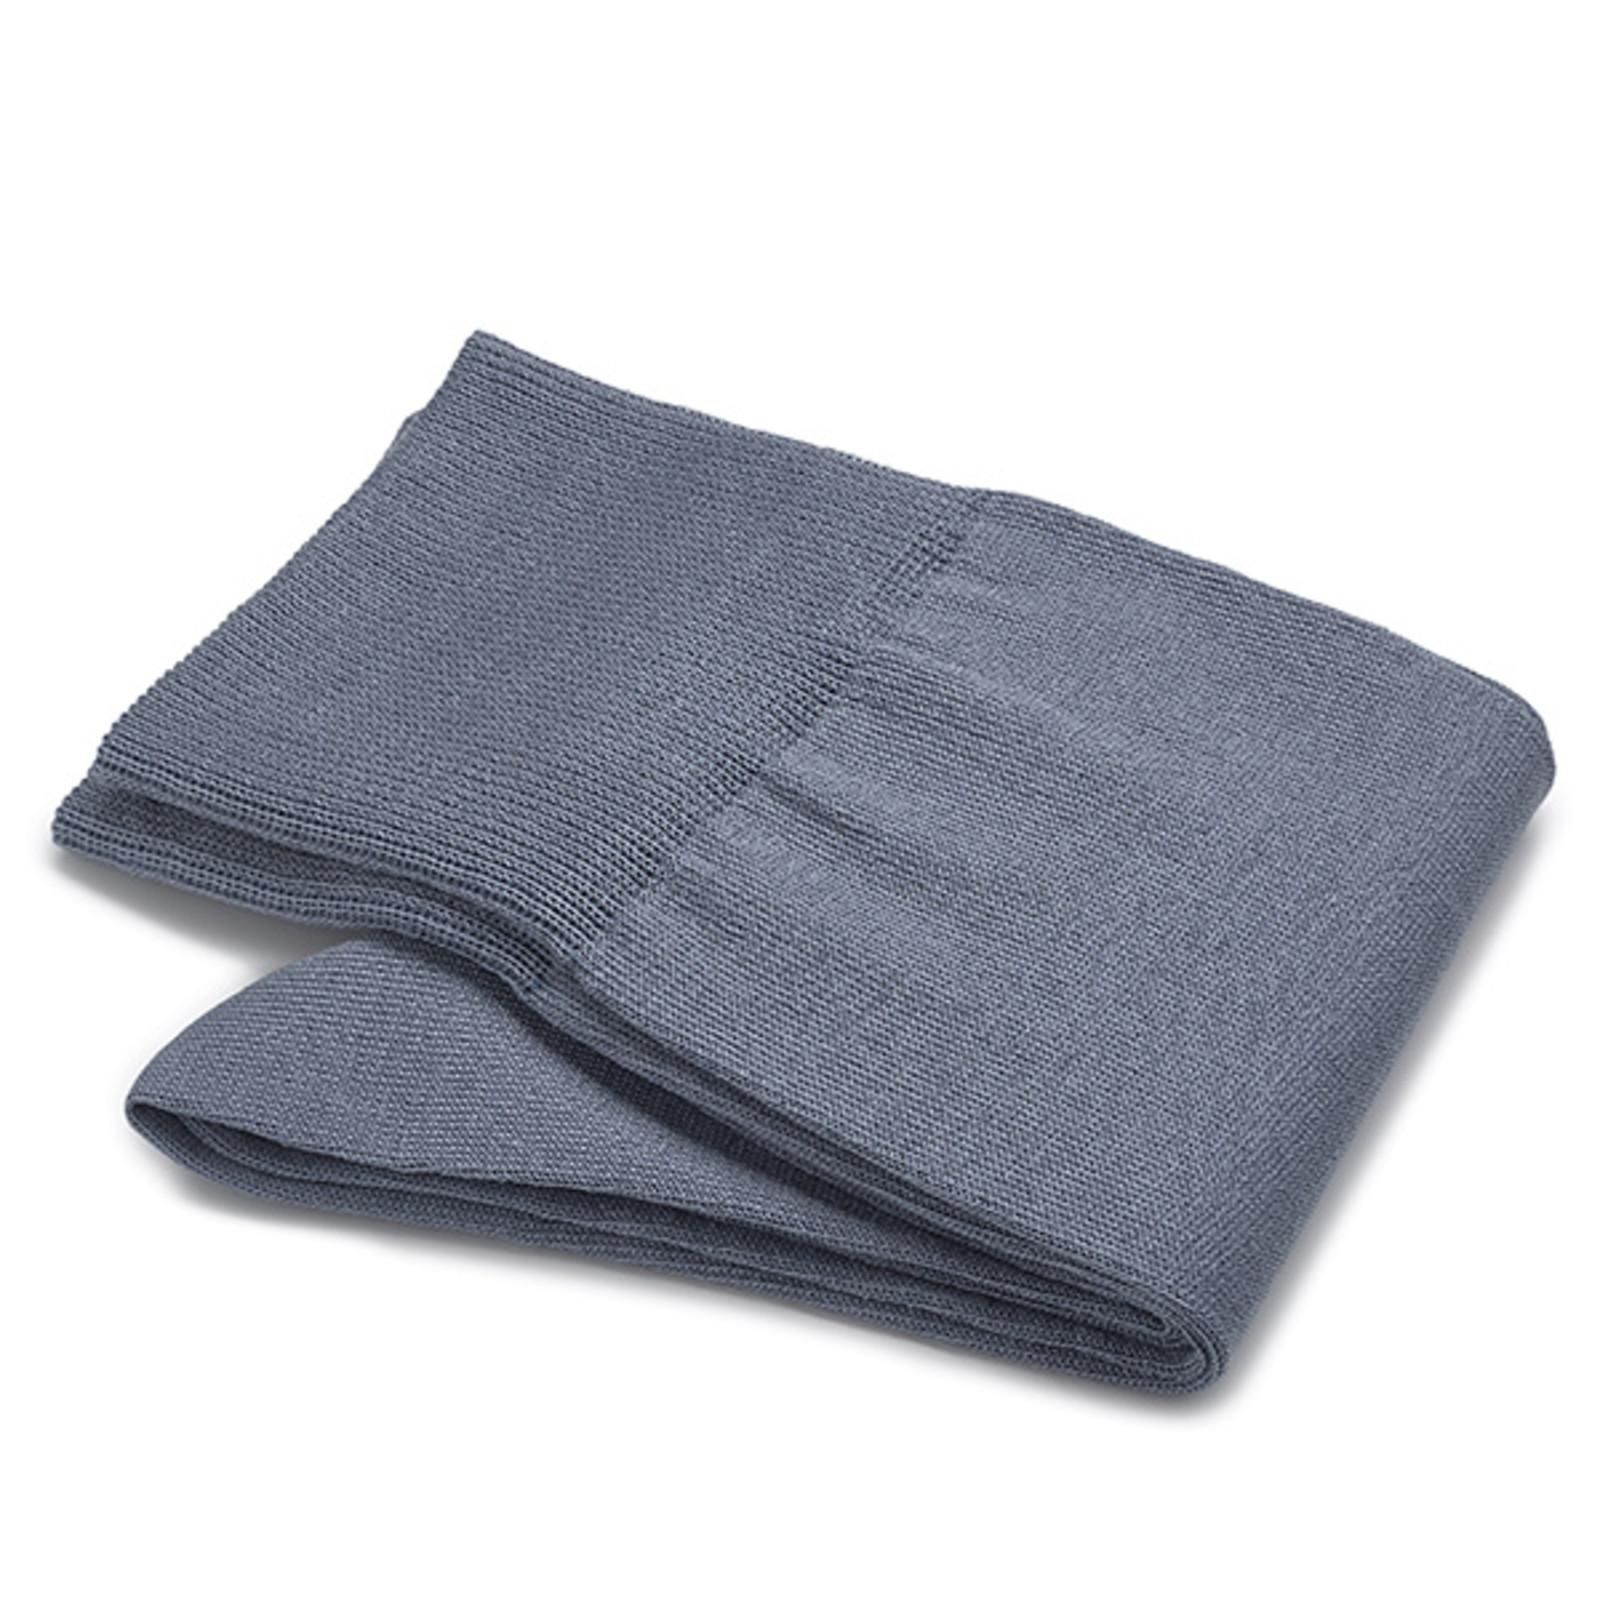 Carlo Lanza Blau/ graue Socken Baumwolle